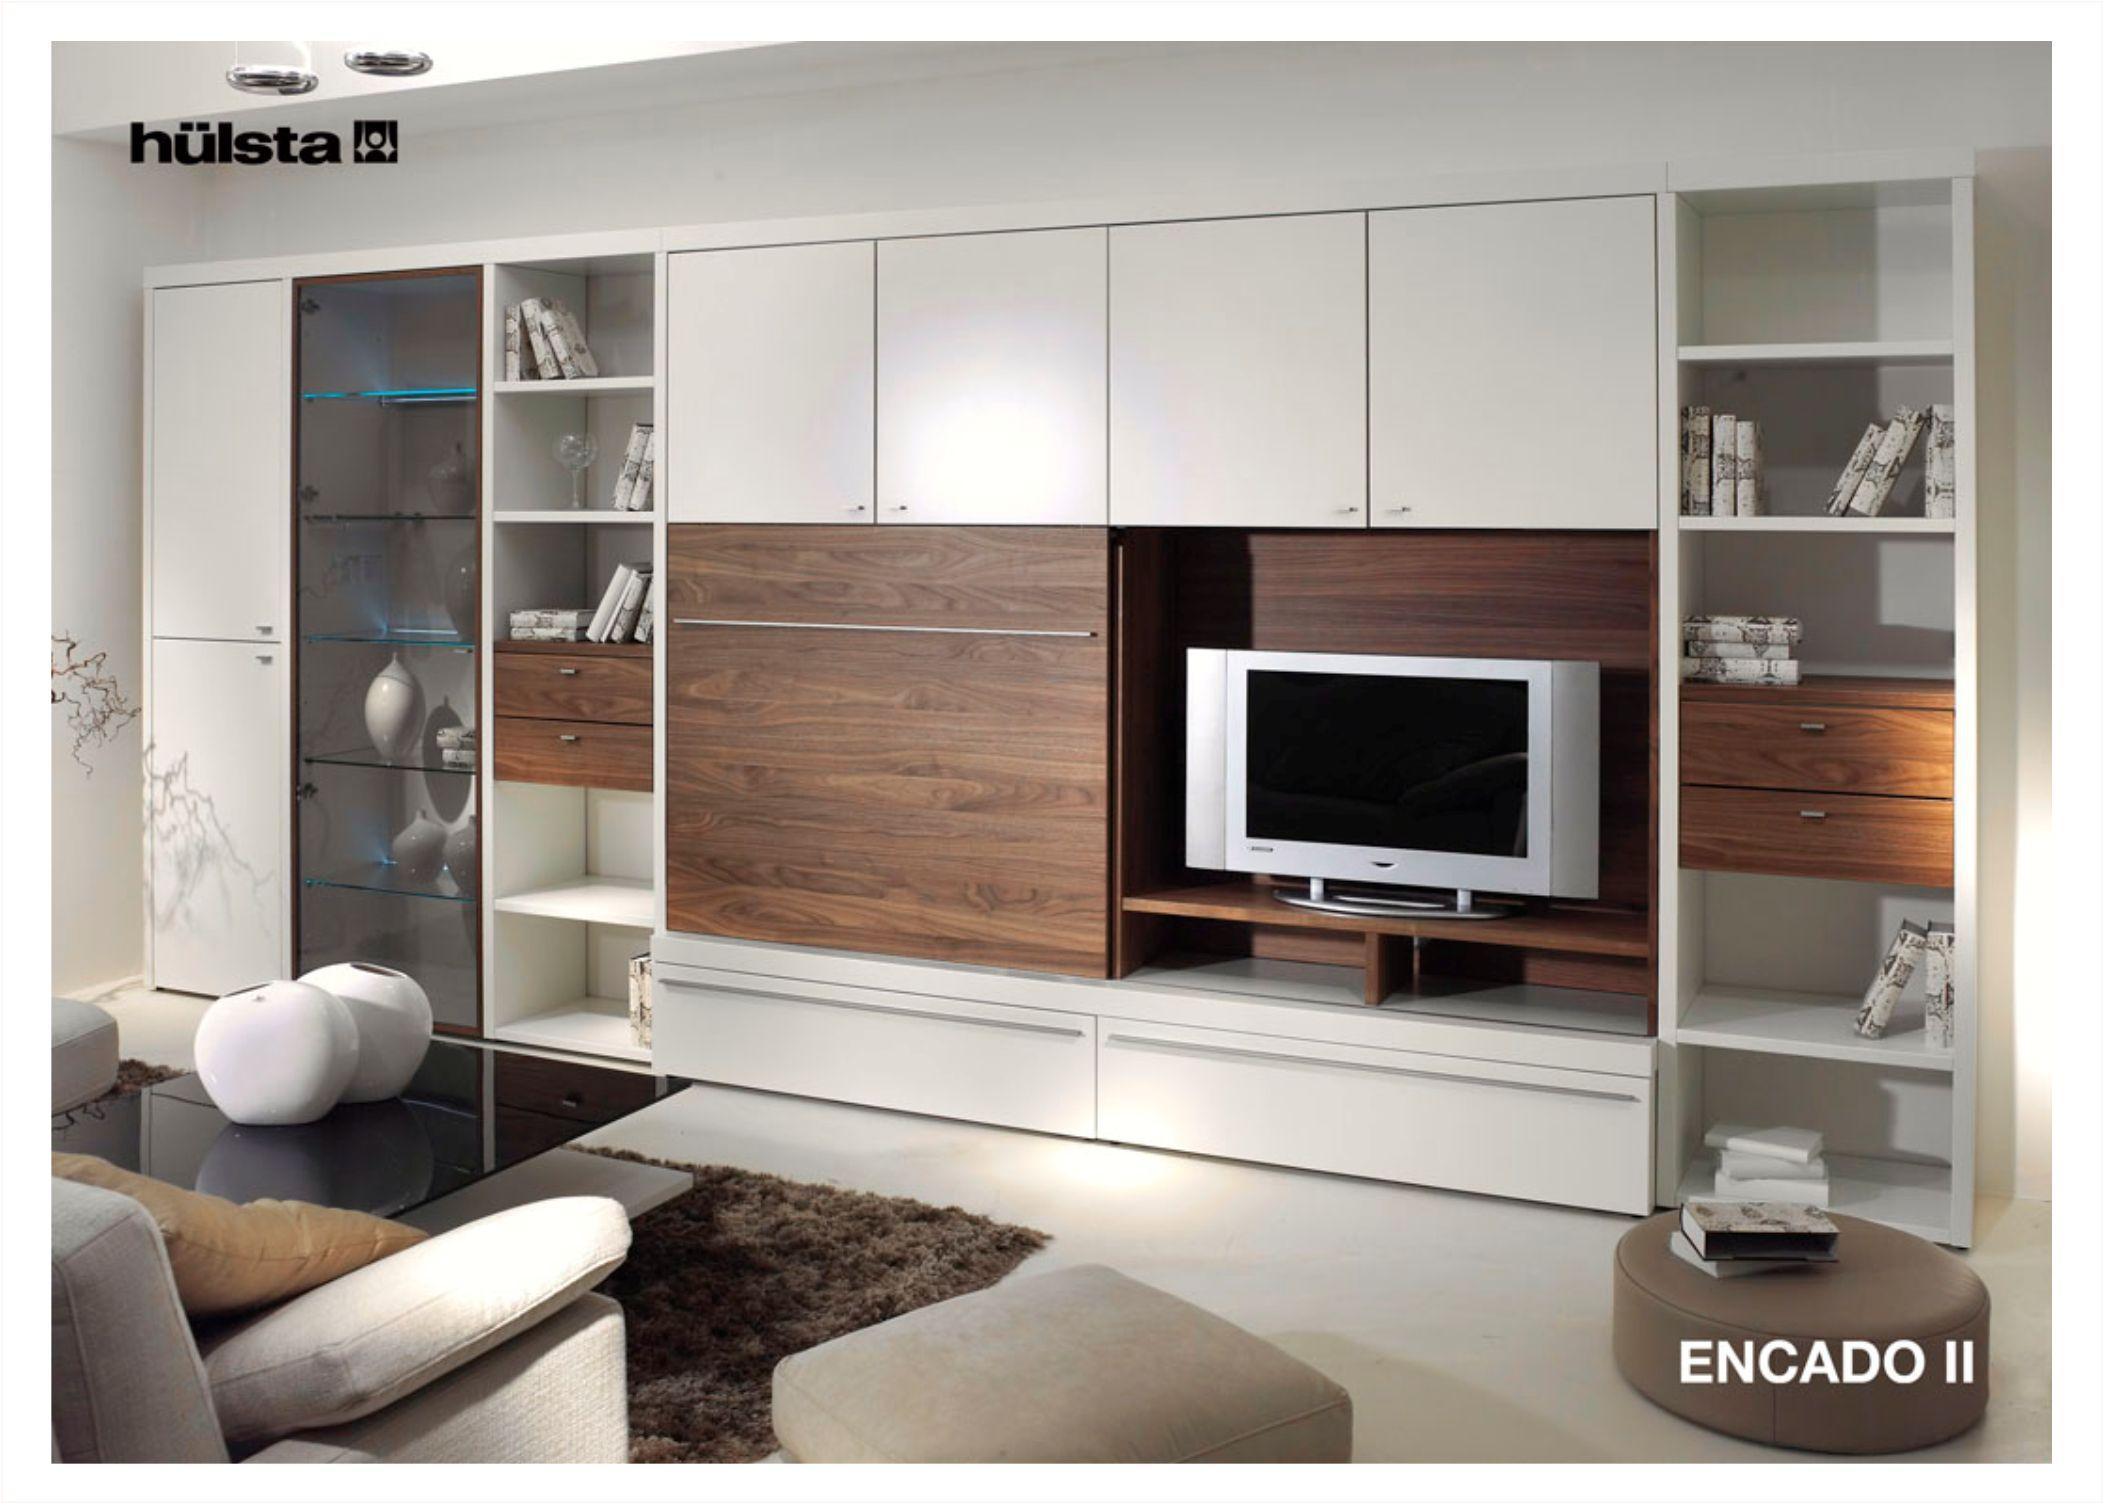 huelsta encado ii cool living rooms pinterest meuble tv tv et meubles. Black Bedroom Furniture Sets. Home Design Ideas